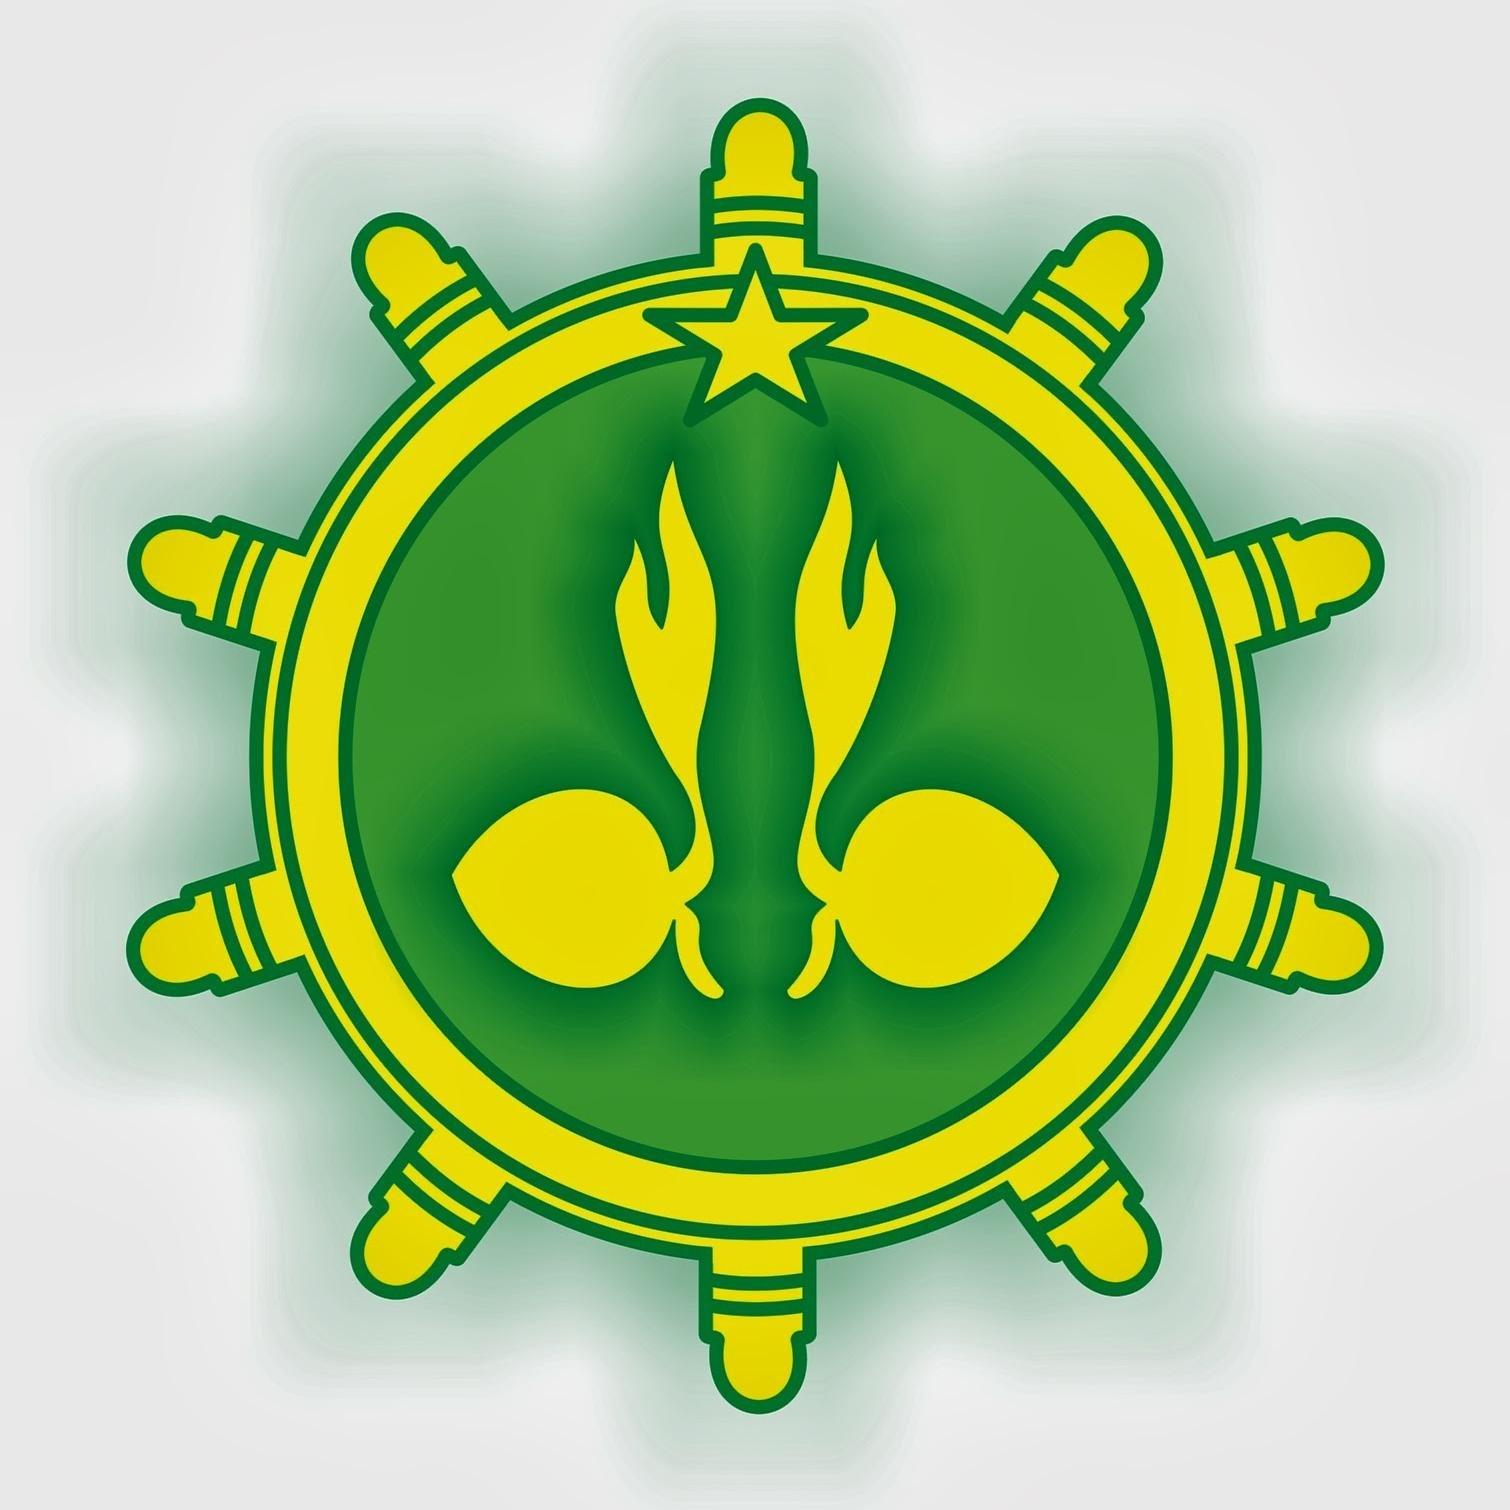 Dkc Kota Yogyakarta On Twitter Administrasi 1surat